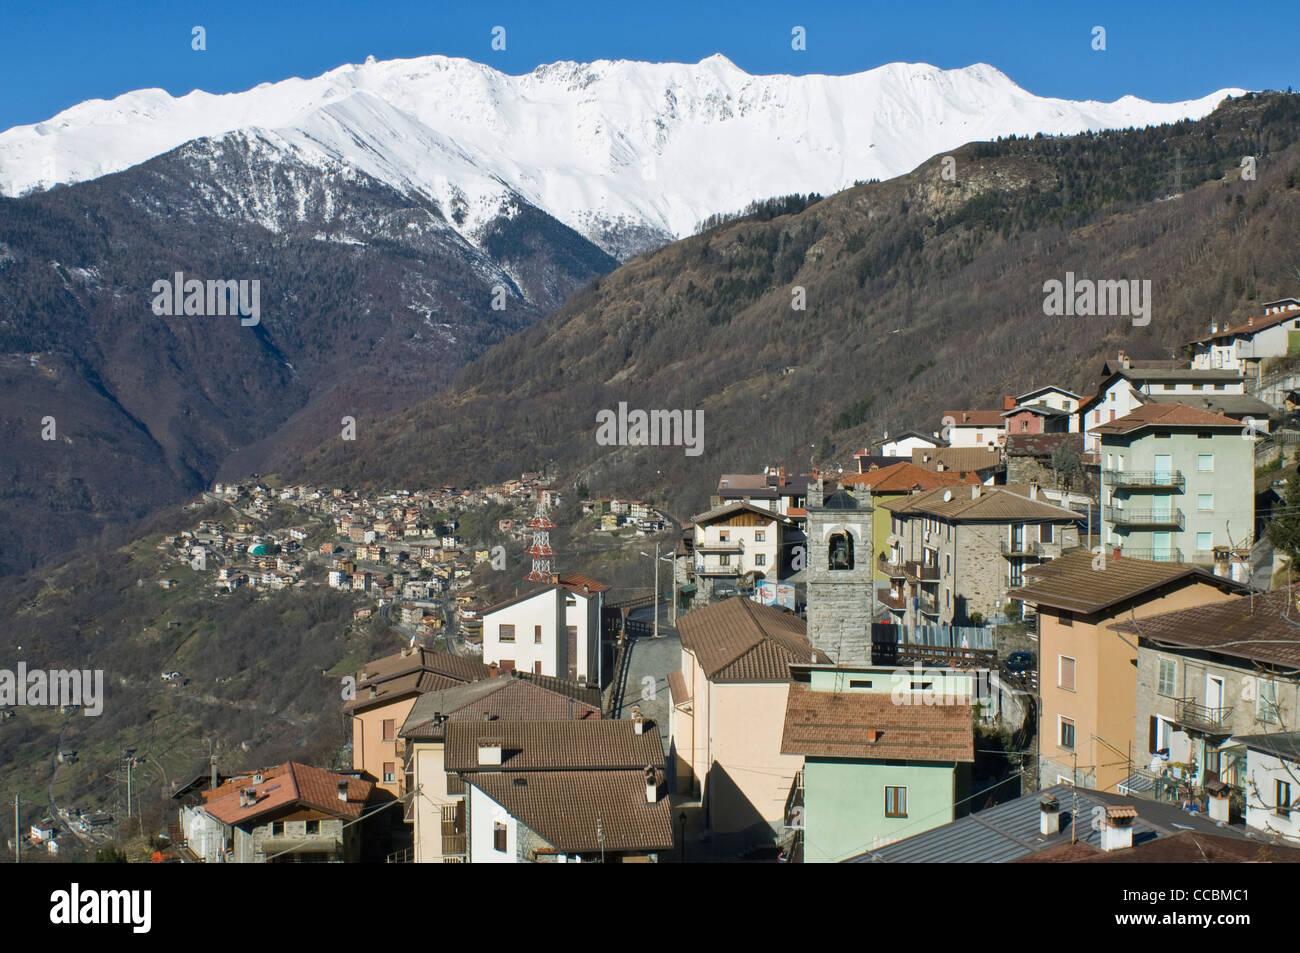 Village de monte, berzo demo, italie Photo Stock